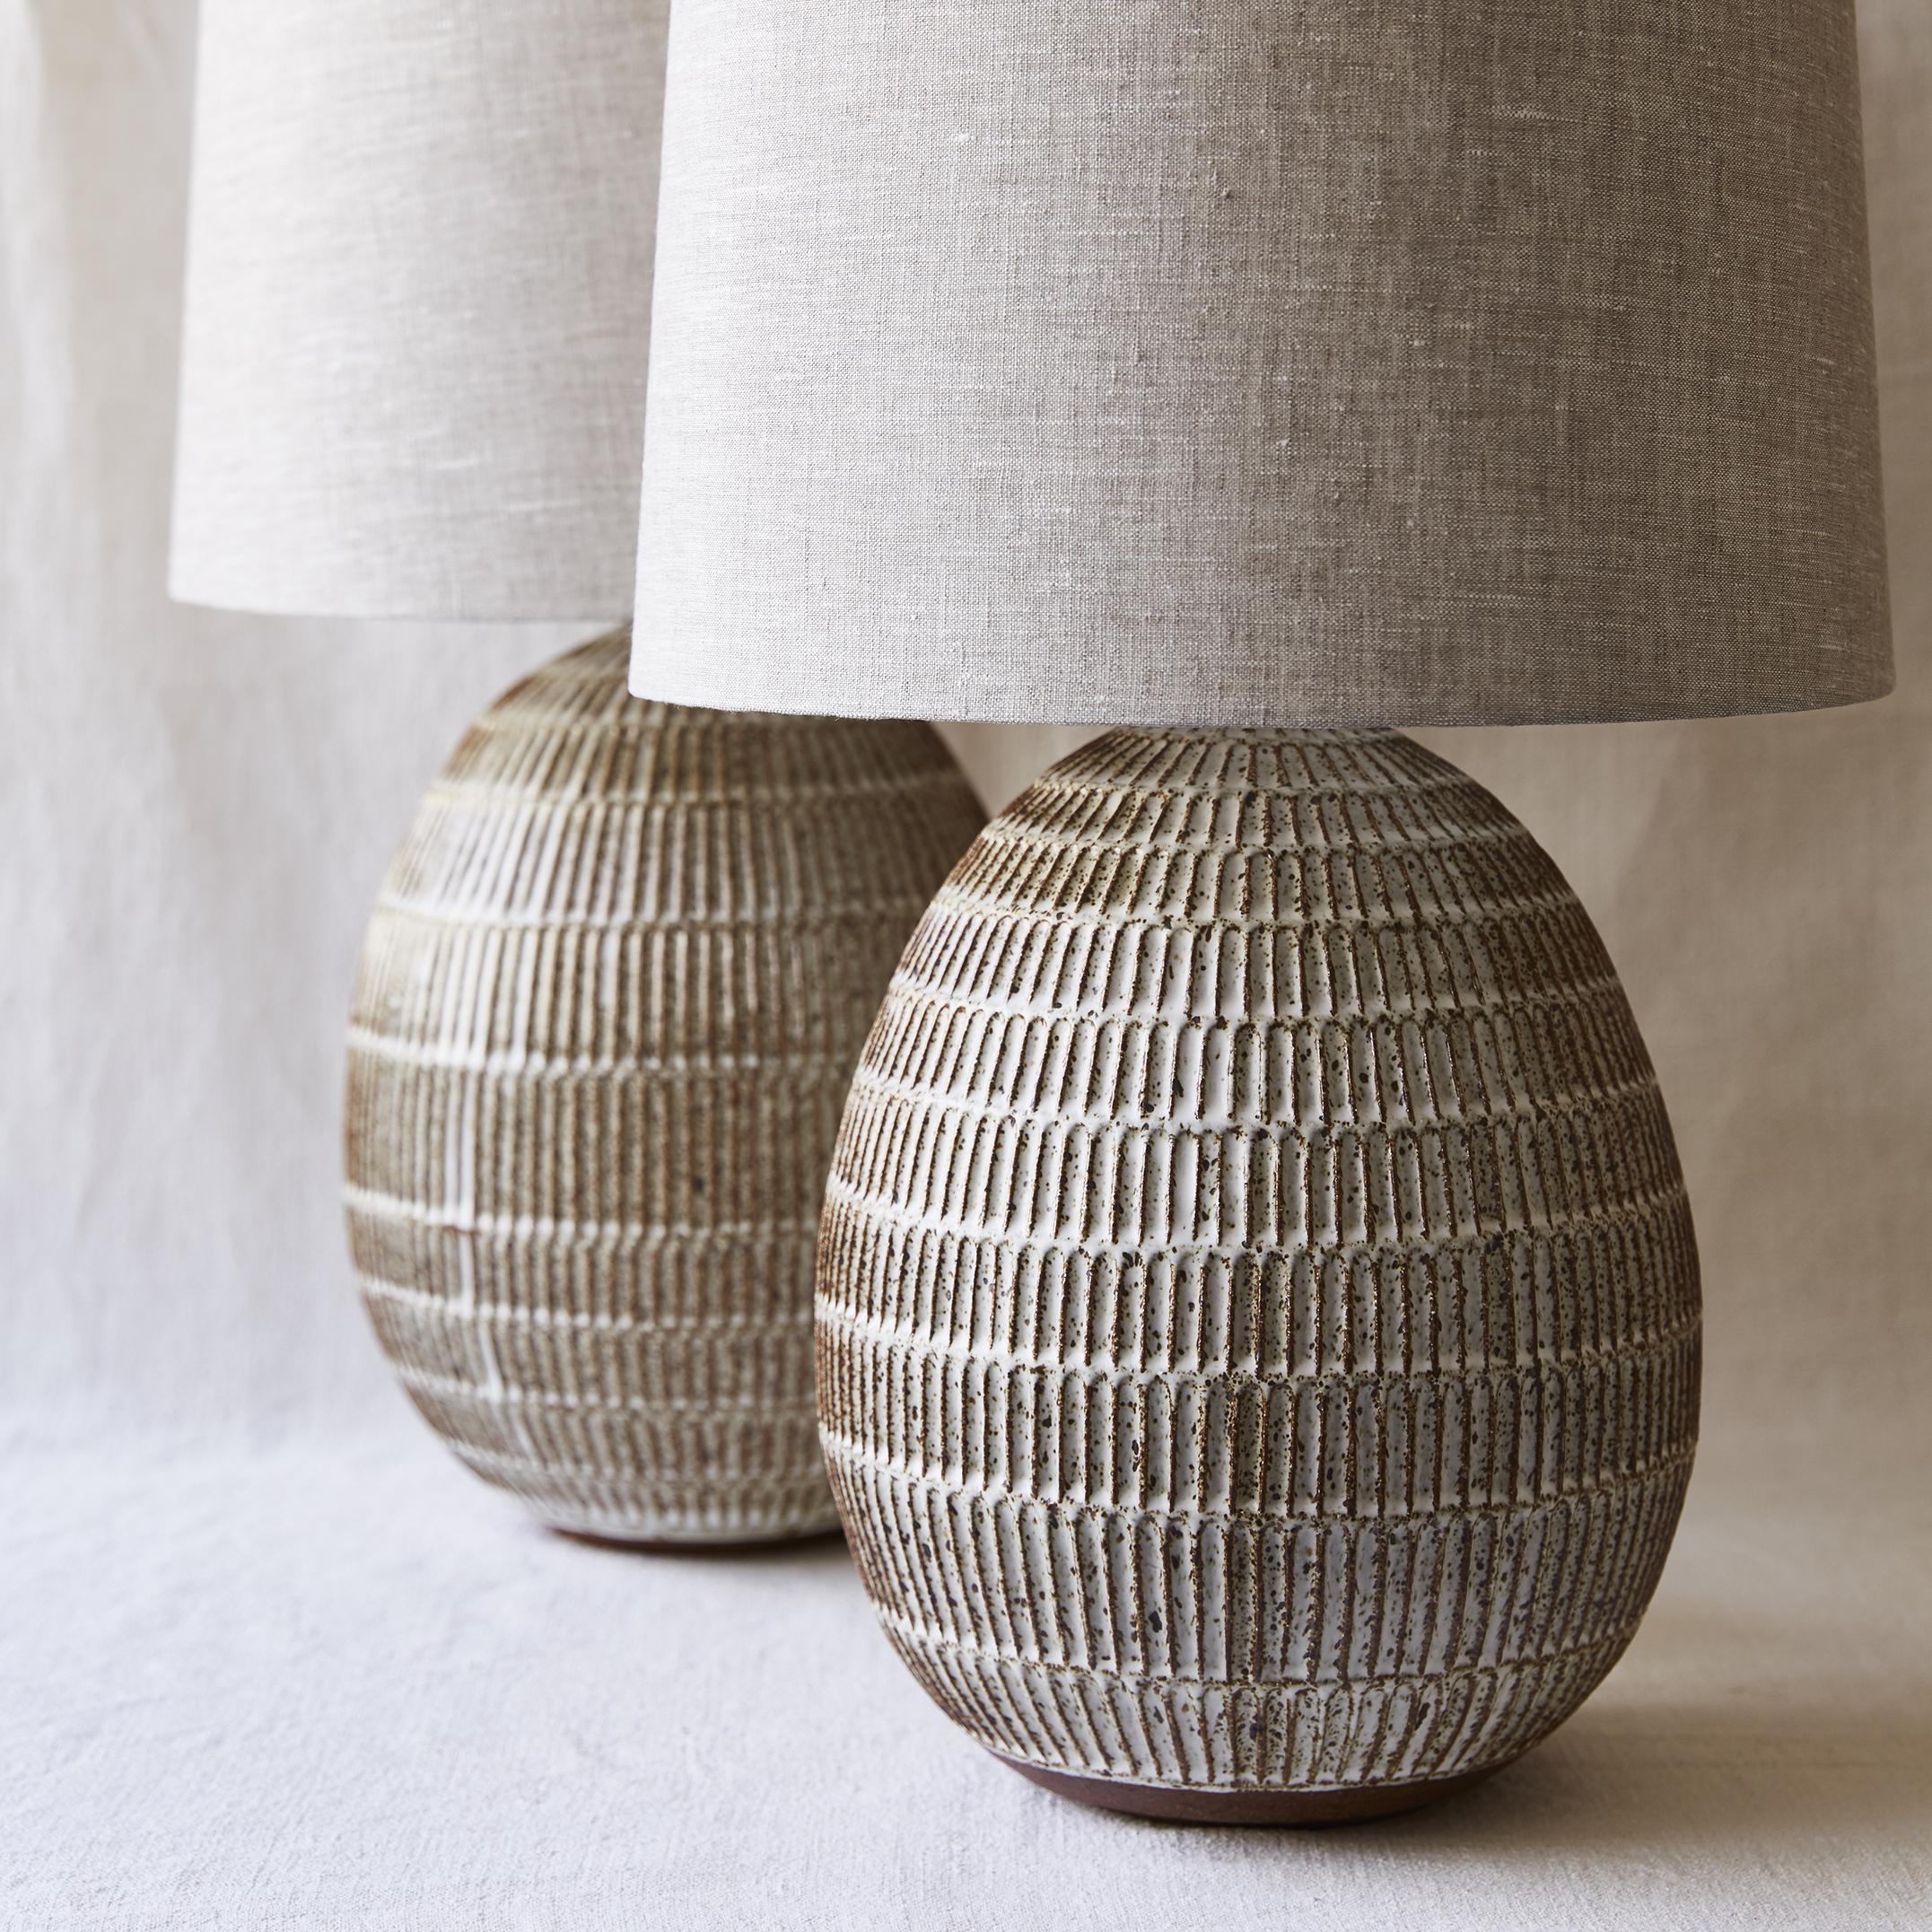 Mt Washington Pottery carved egg lamps sq.jpg